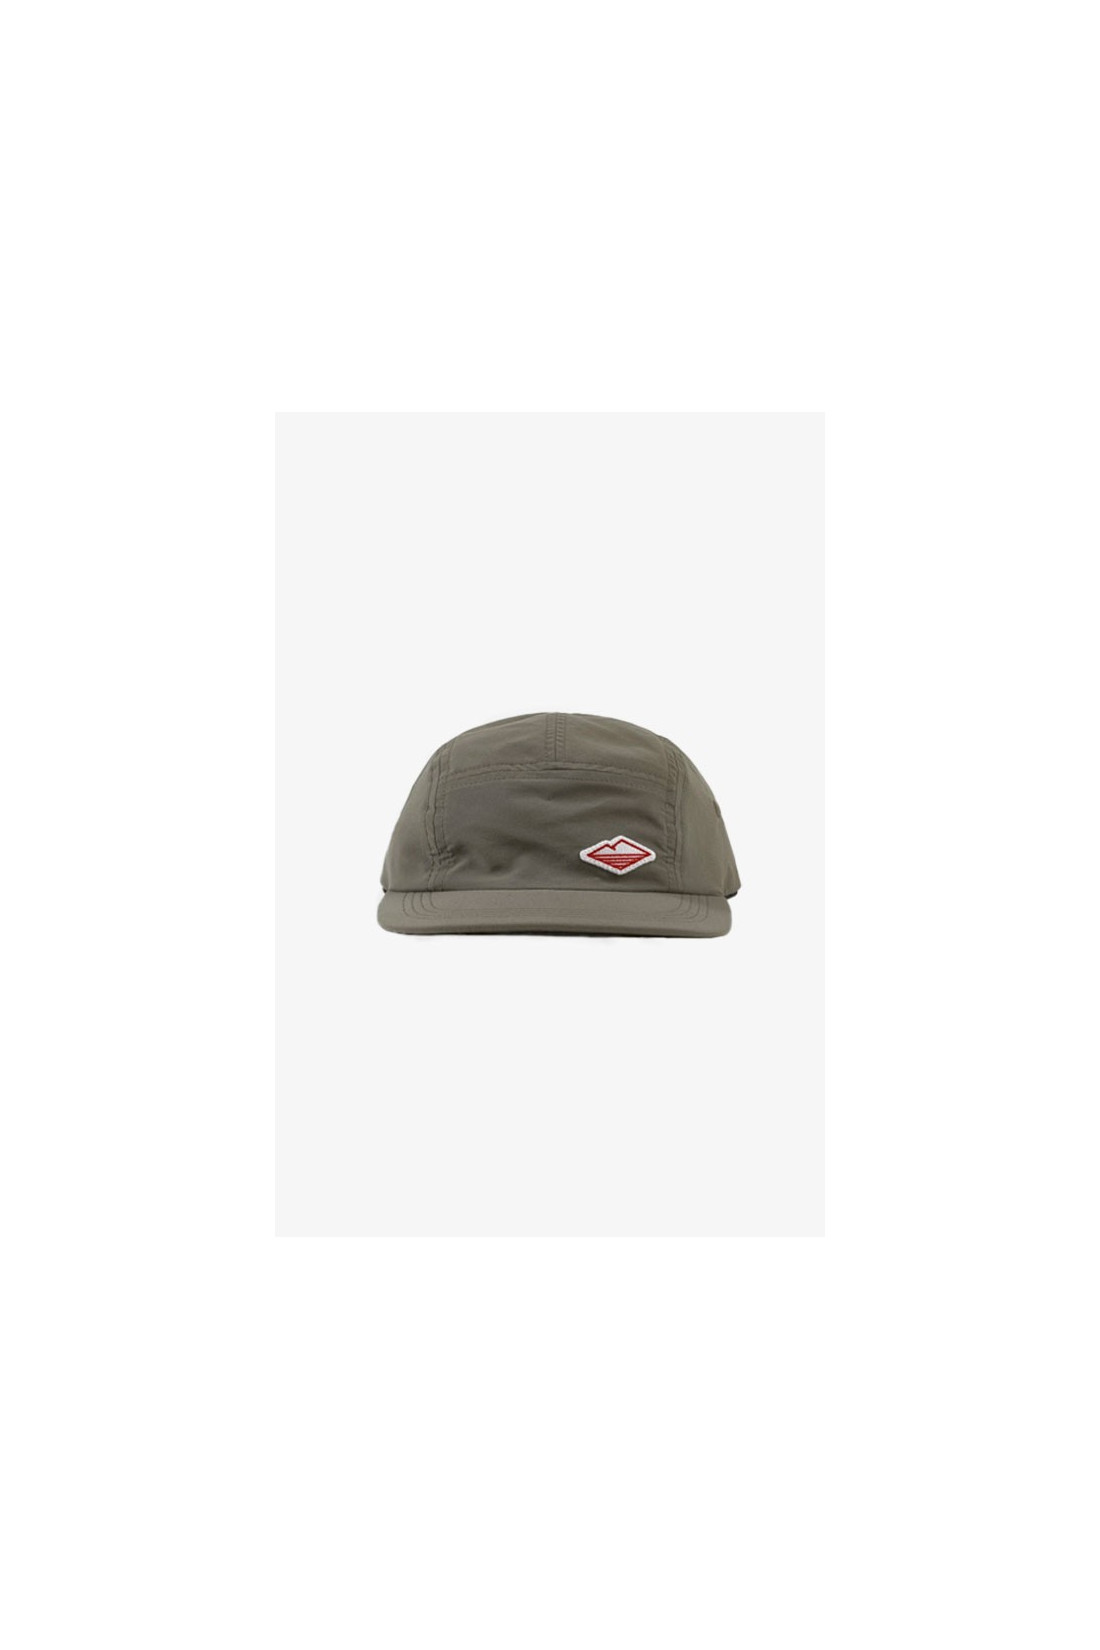 BATTENWEAR / Nylon travel cap Olive